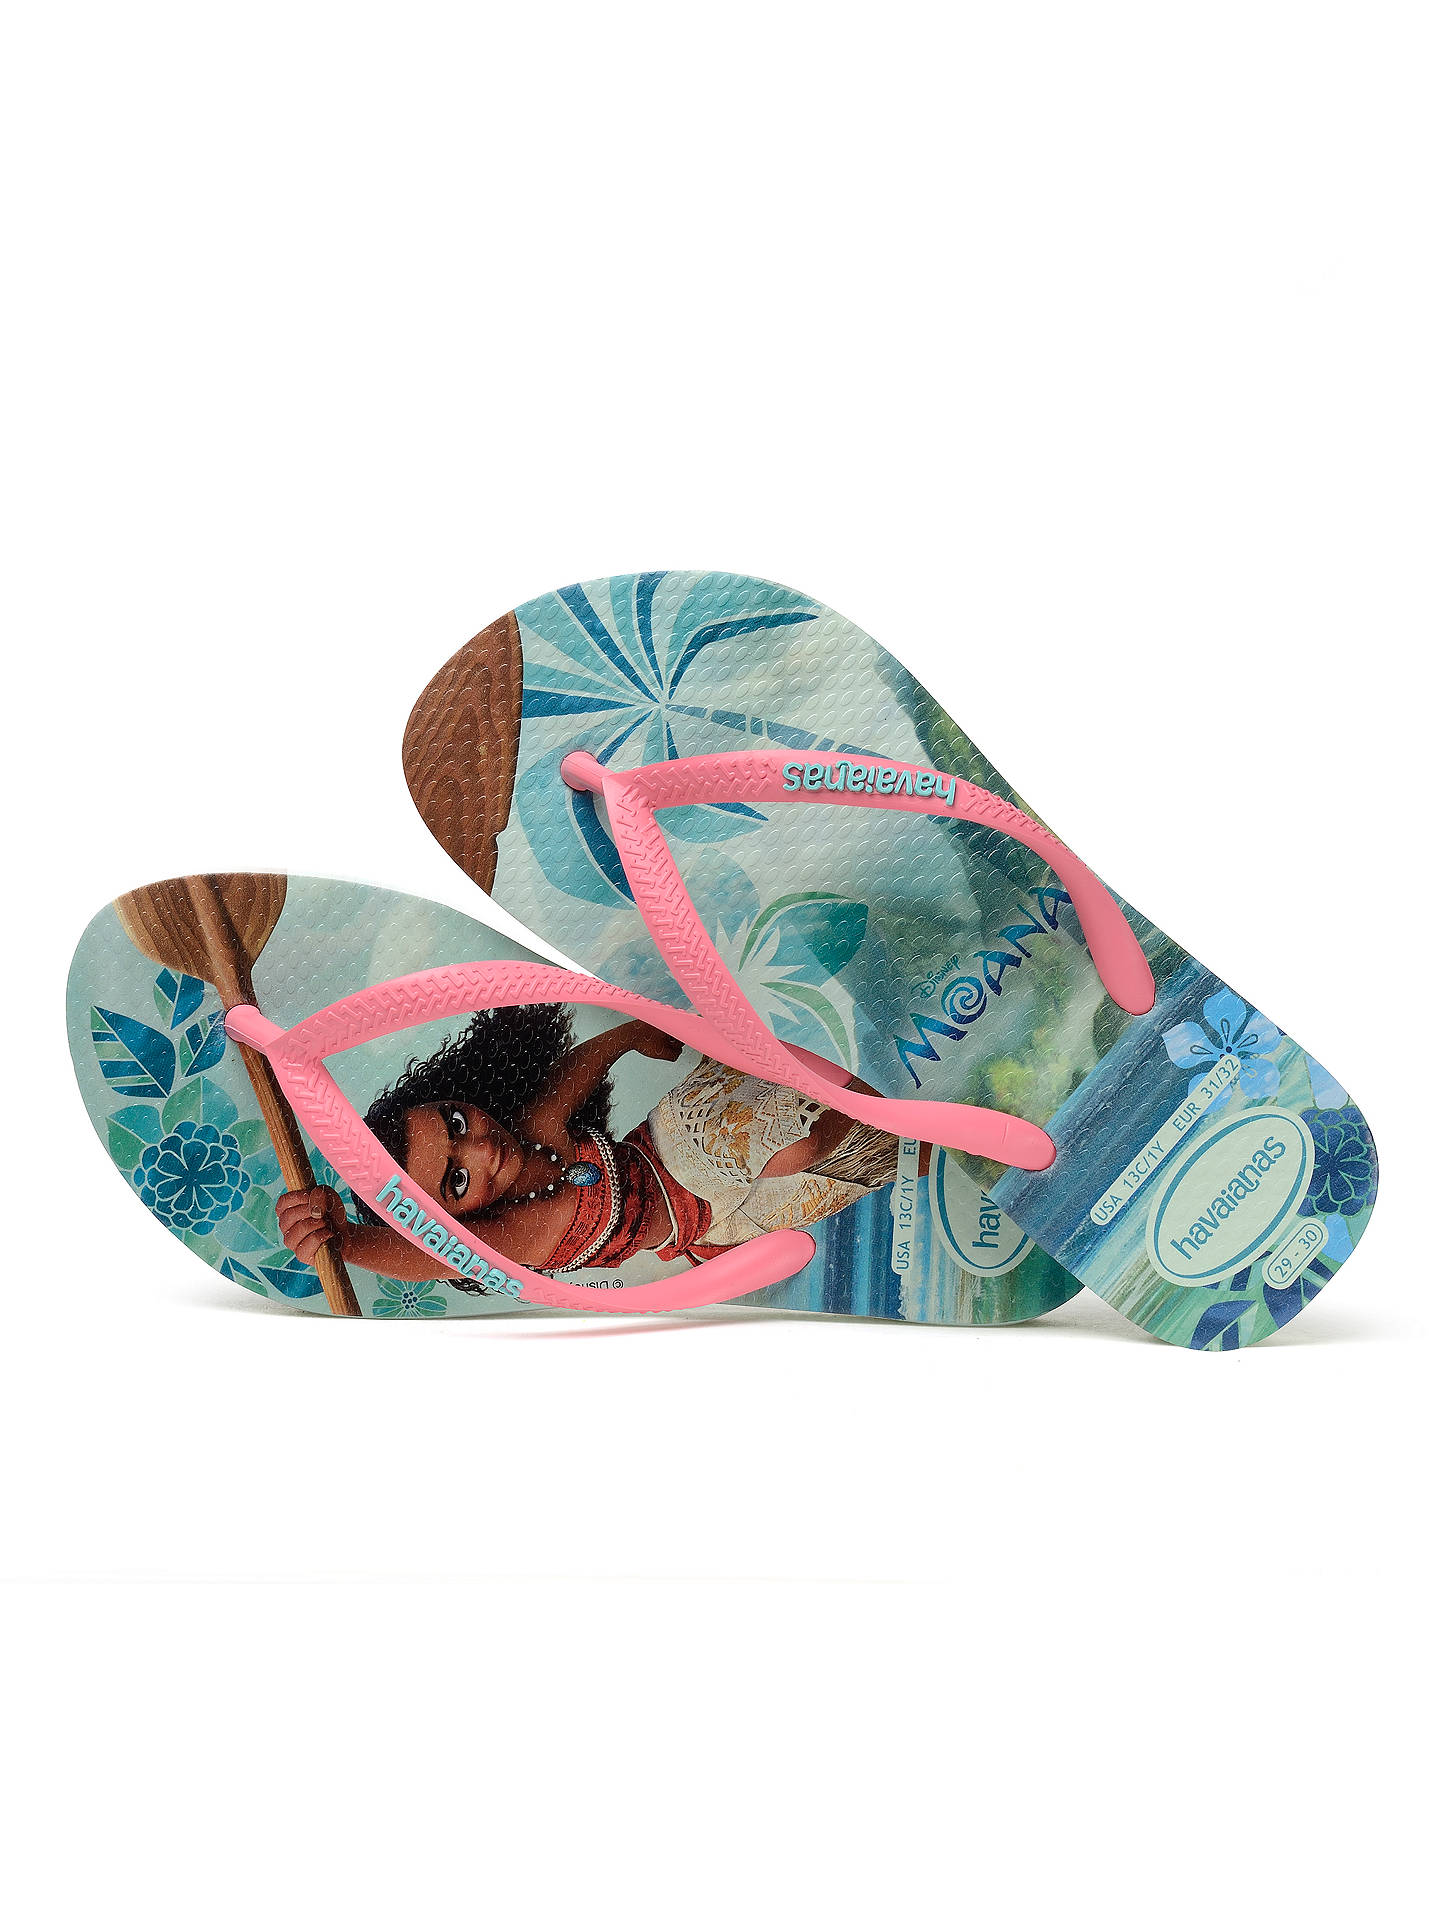 eda5ef5e8661 ... Buy Havaianas Children s Slim Moana Flip Flops